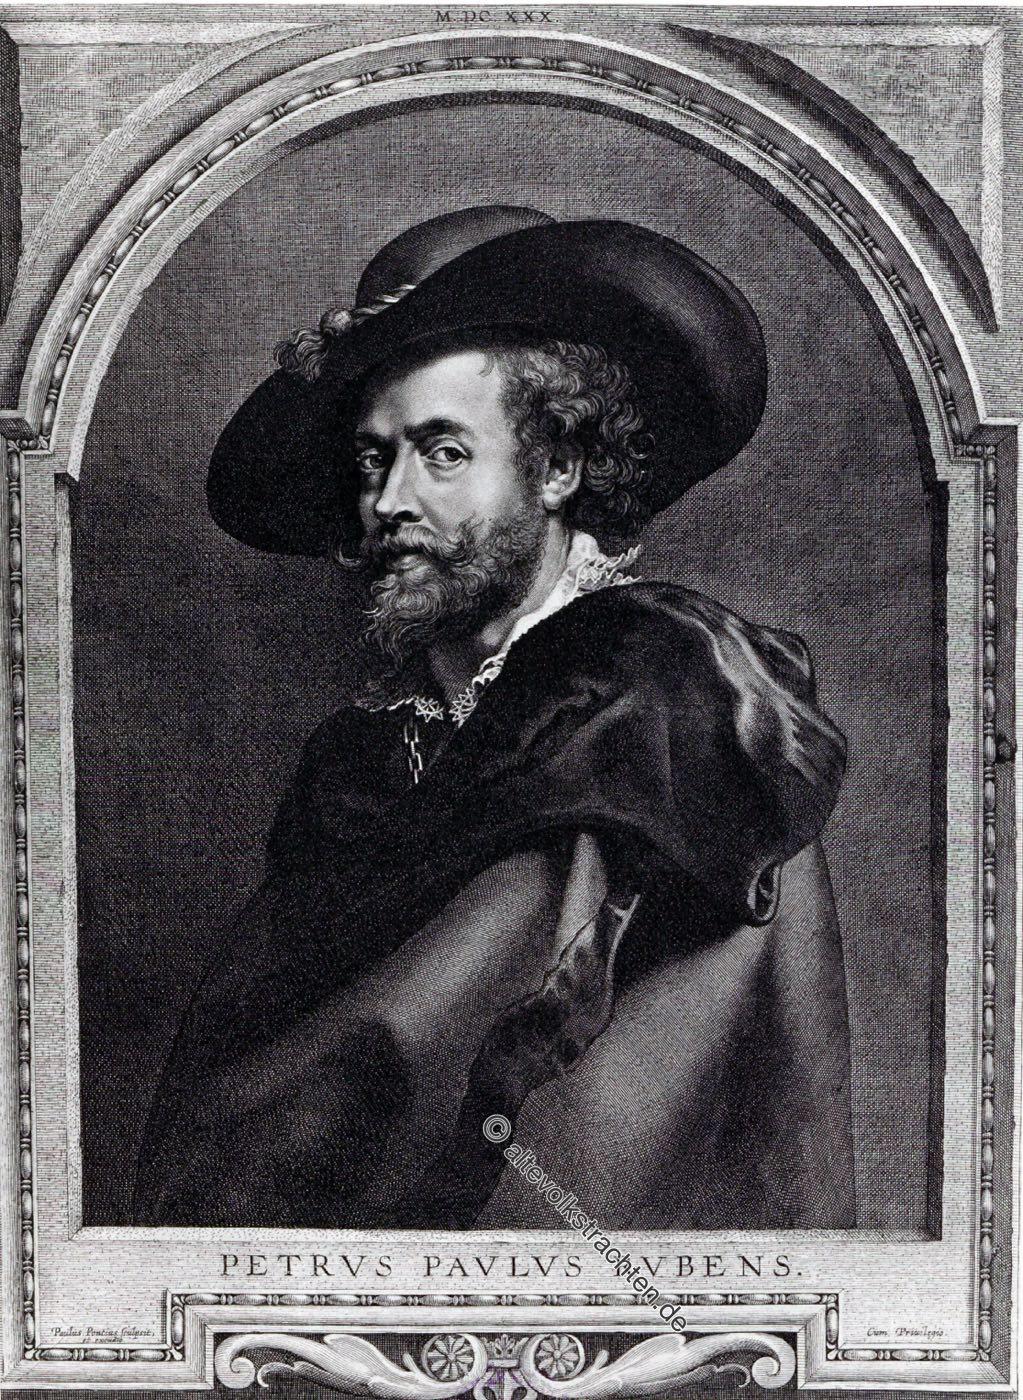 Peter Paul Rubens, Flämischer Maler, Barock, Niederlande, Portrait, Künstler, Dreissigjähriger Krieg, Diplomat,